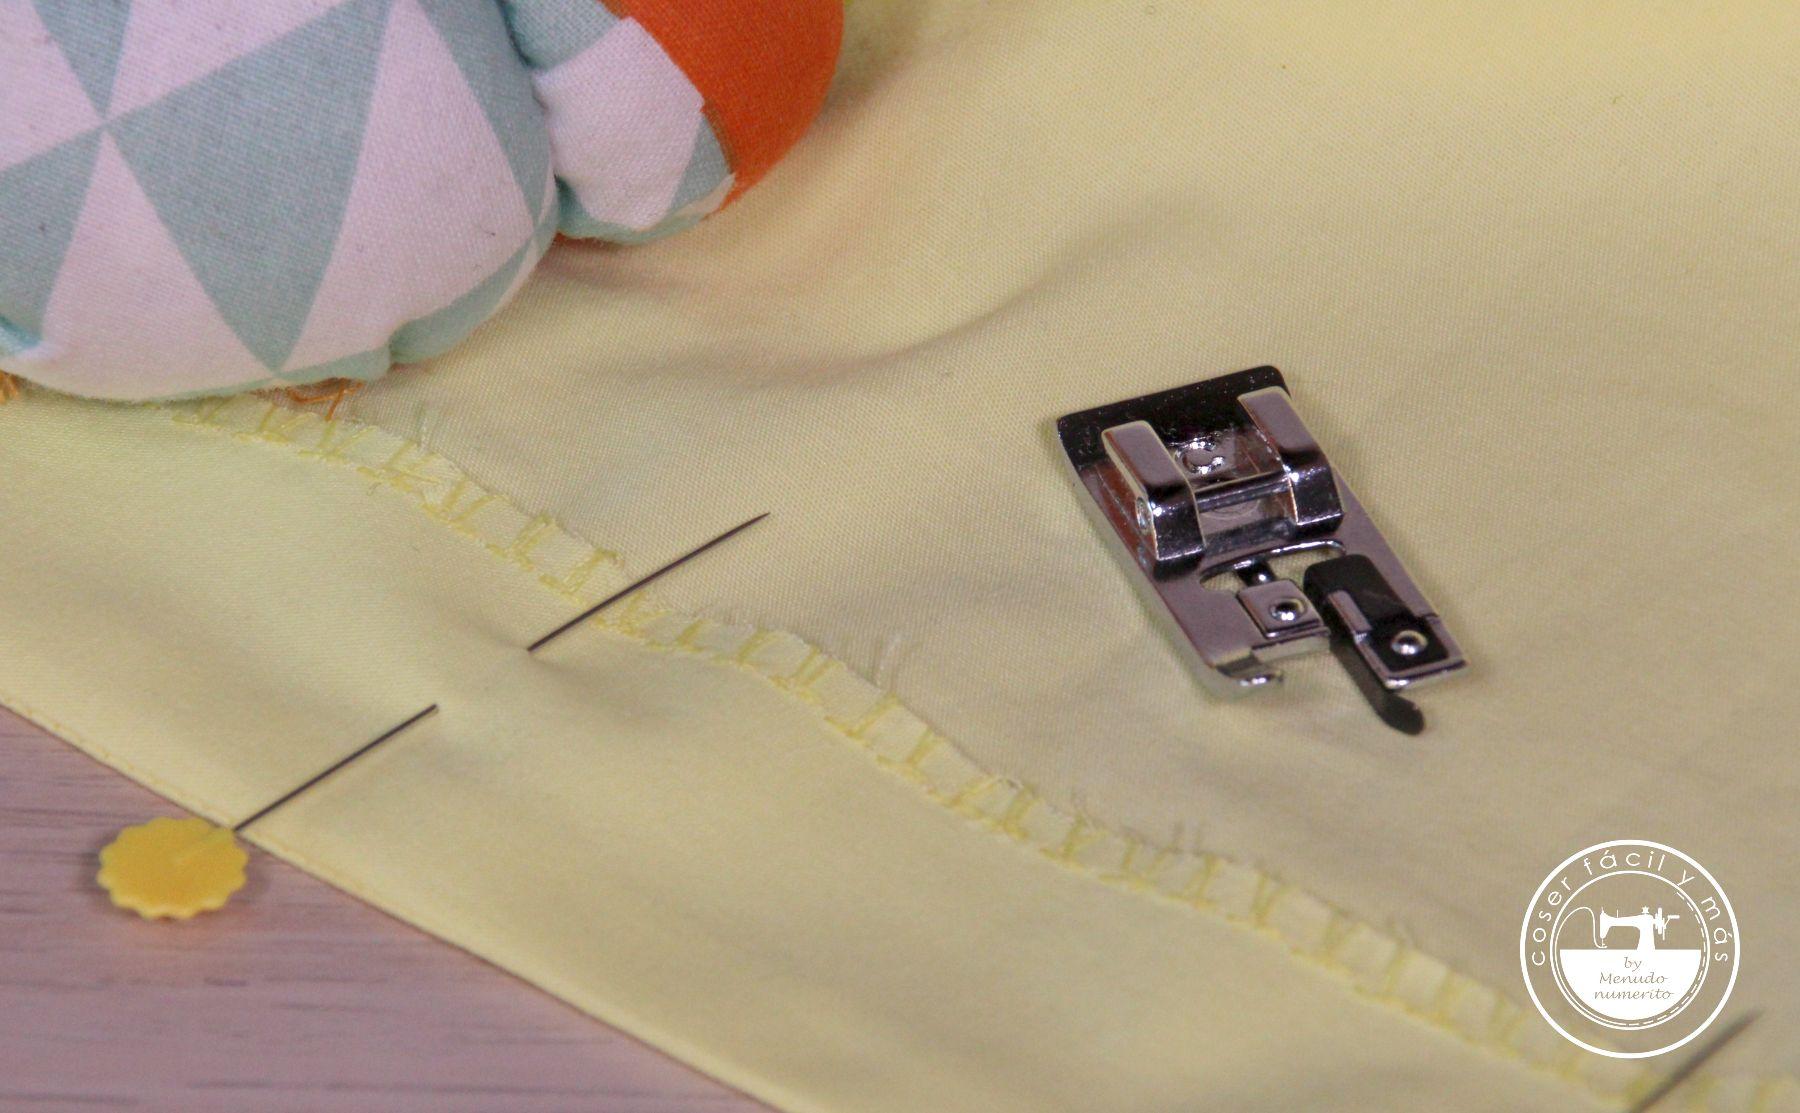 agrandar una blusa coser facil blogs de costura